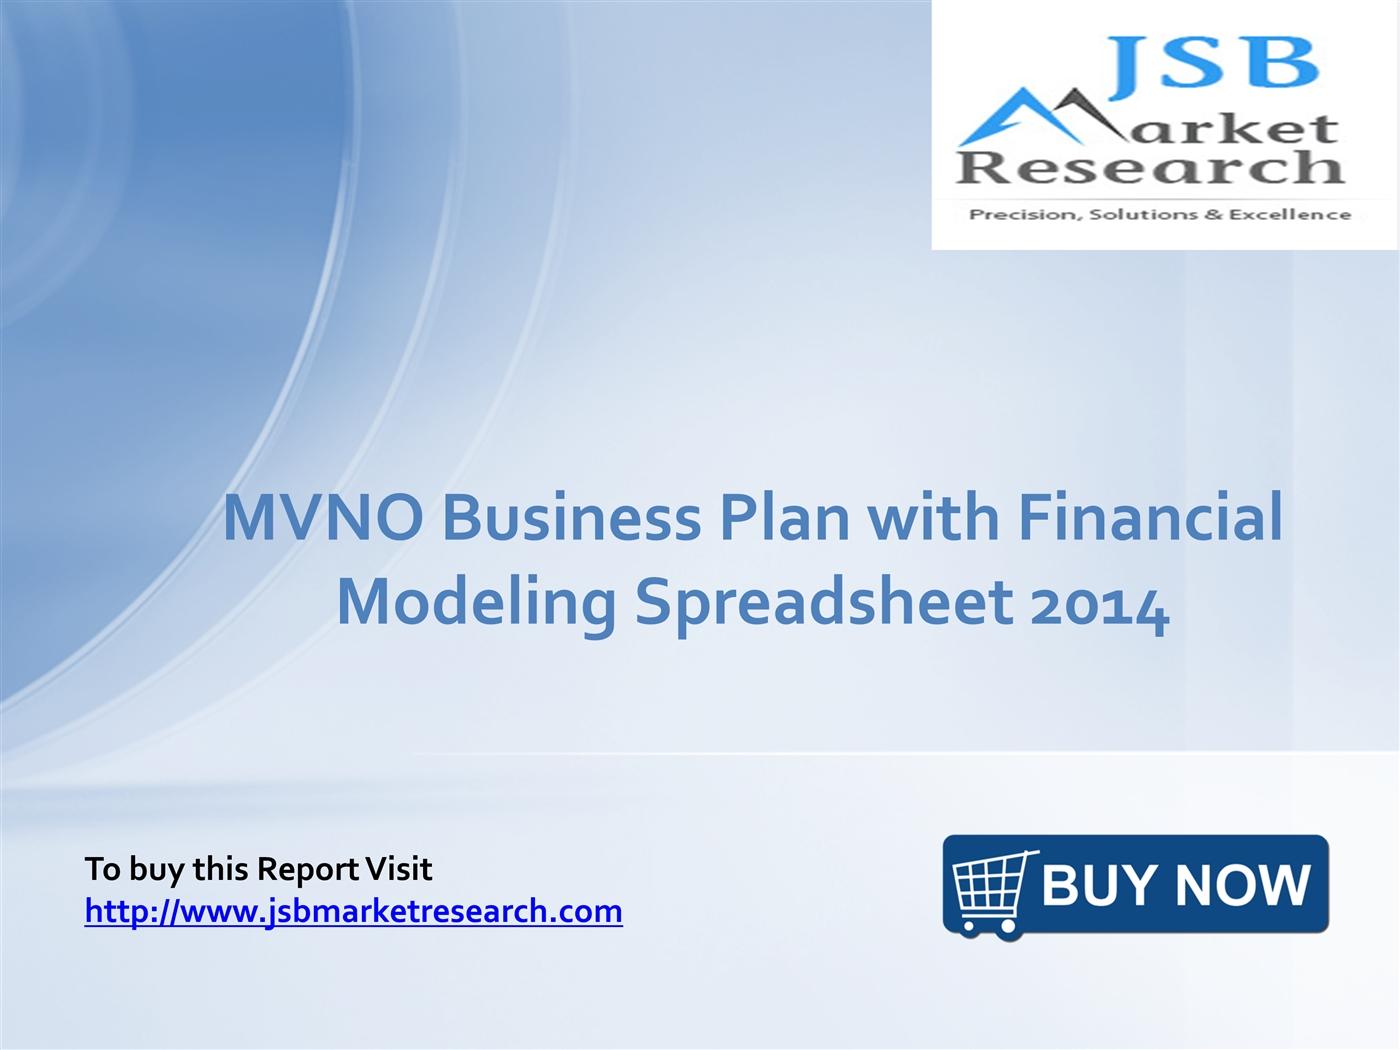 mobile virtual network operator (mvno) business plan